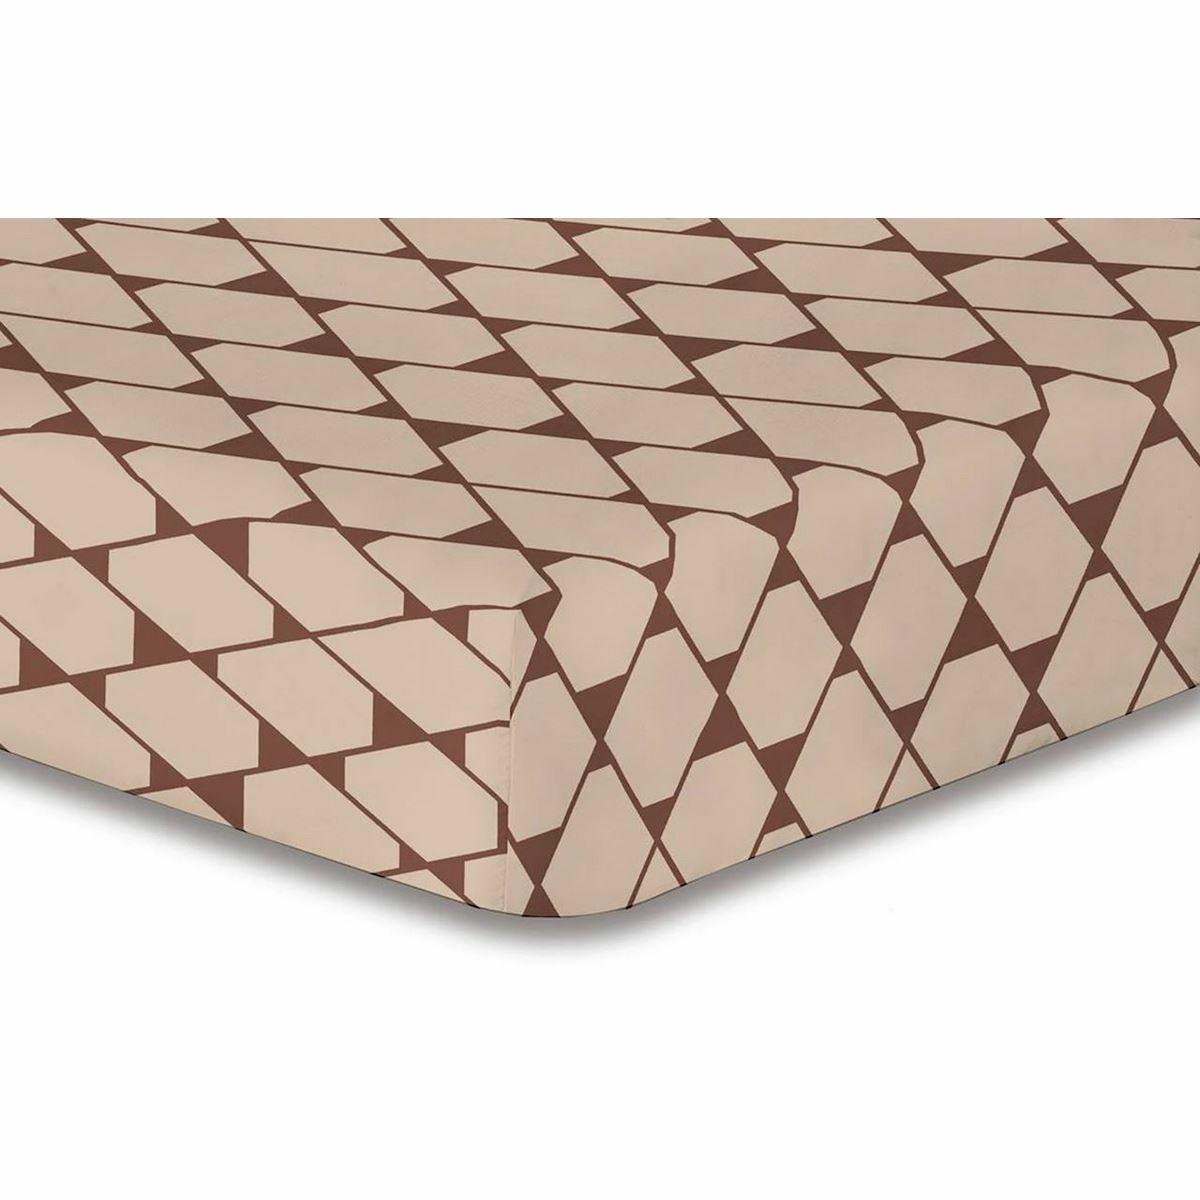 DecoKing Prostěradlo Rhombuses hnědá S1, 160 x 200 cm